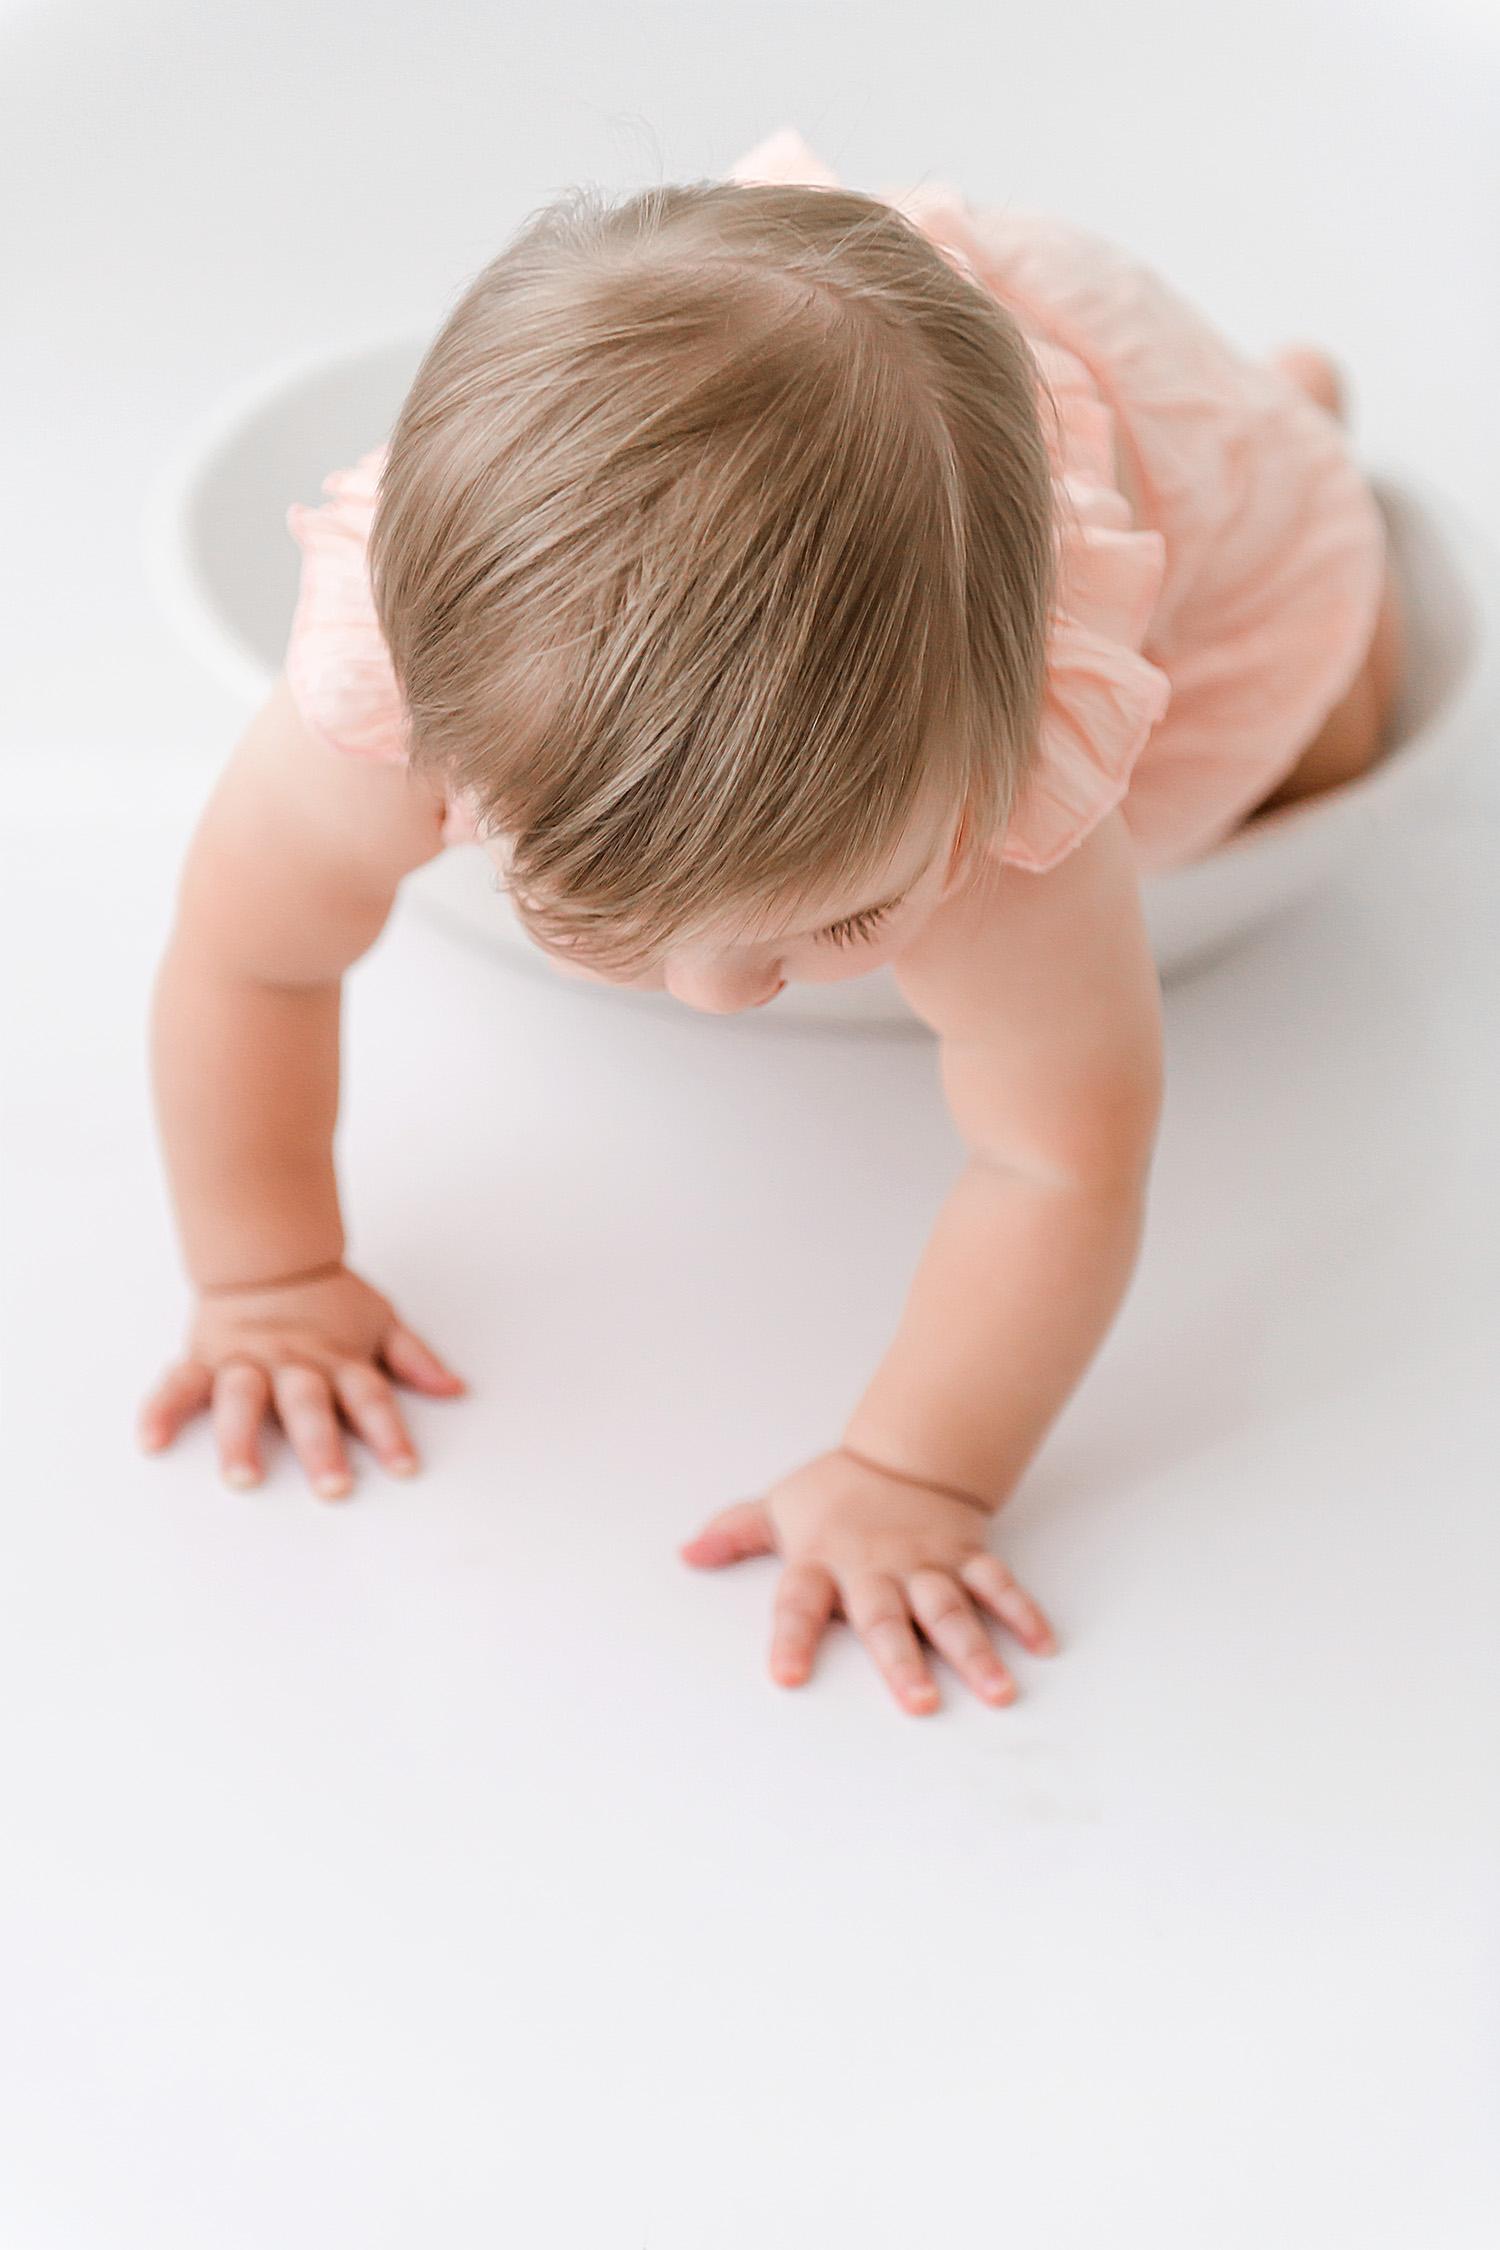 cute-baby-photos-cake-smash.jpg